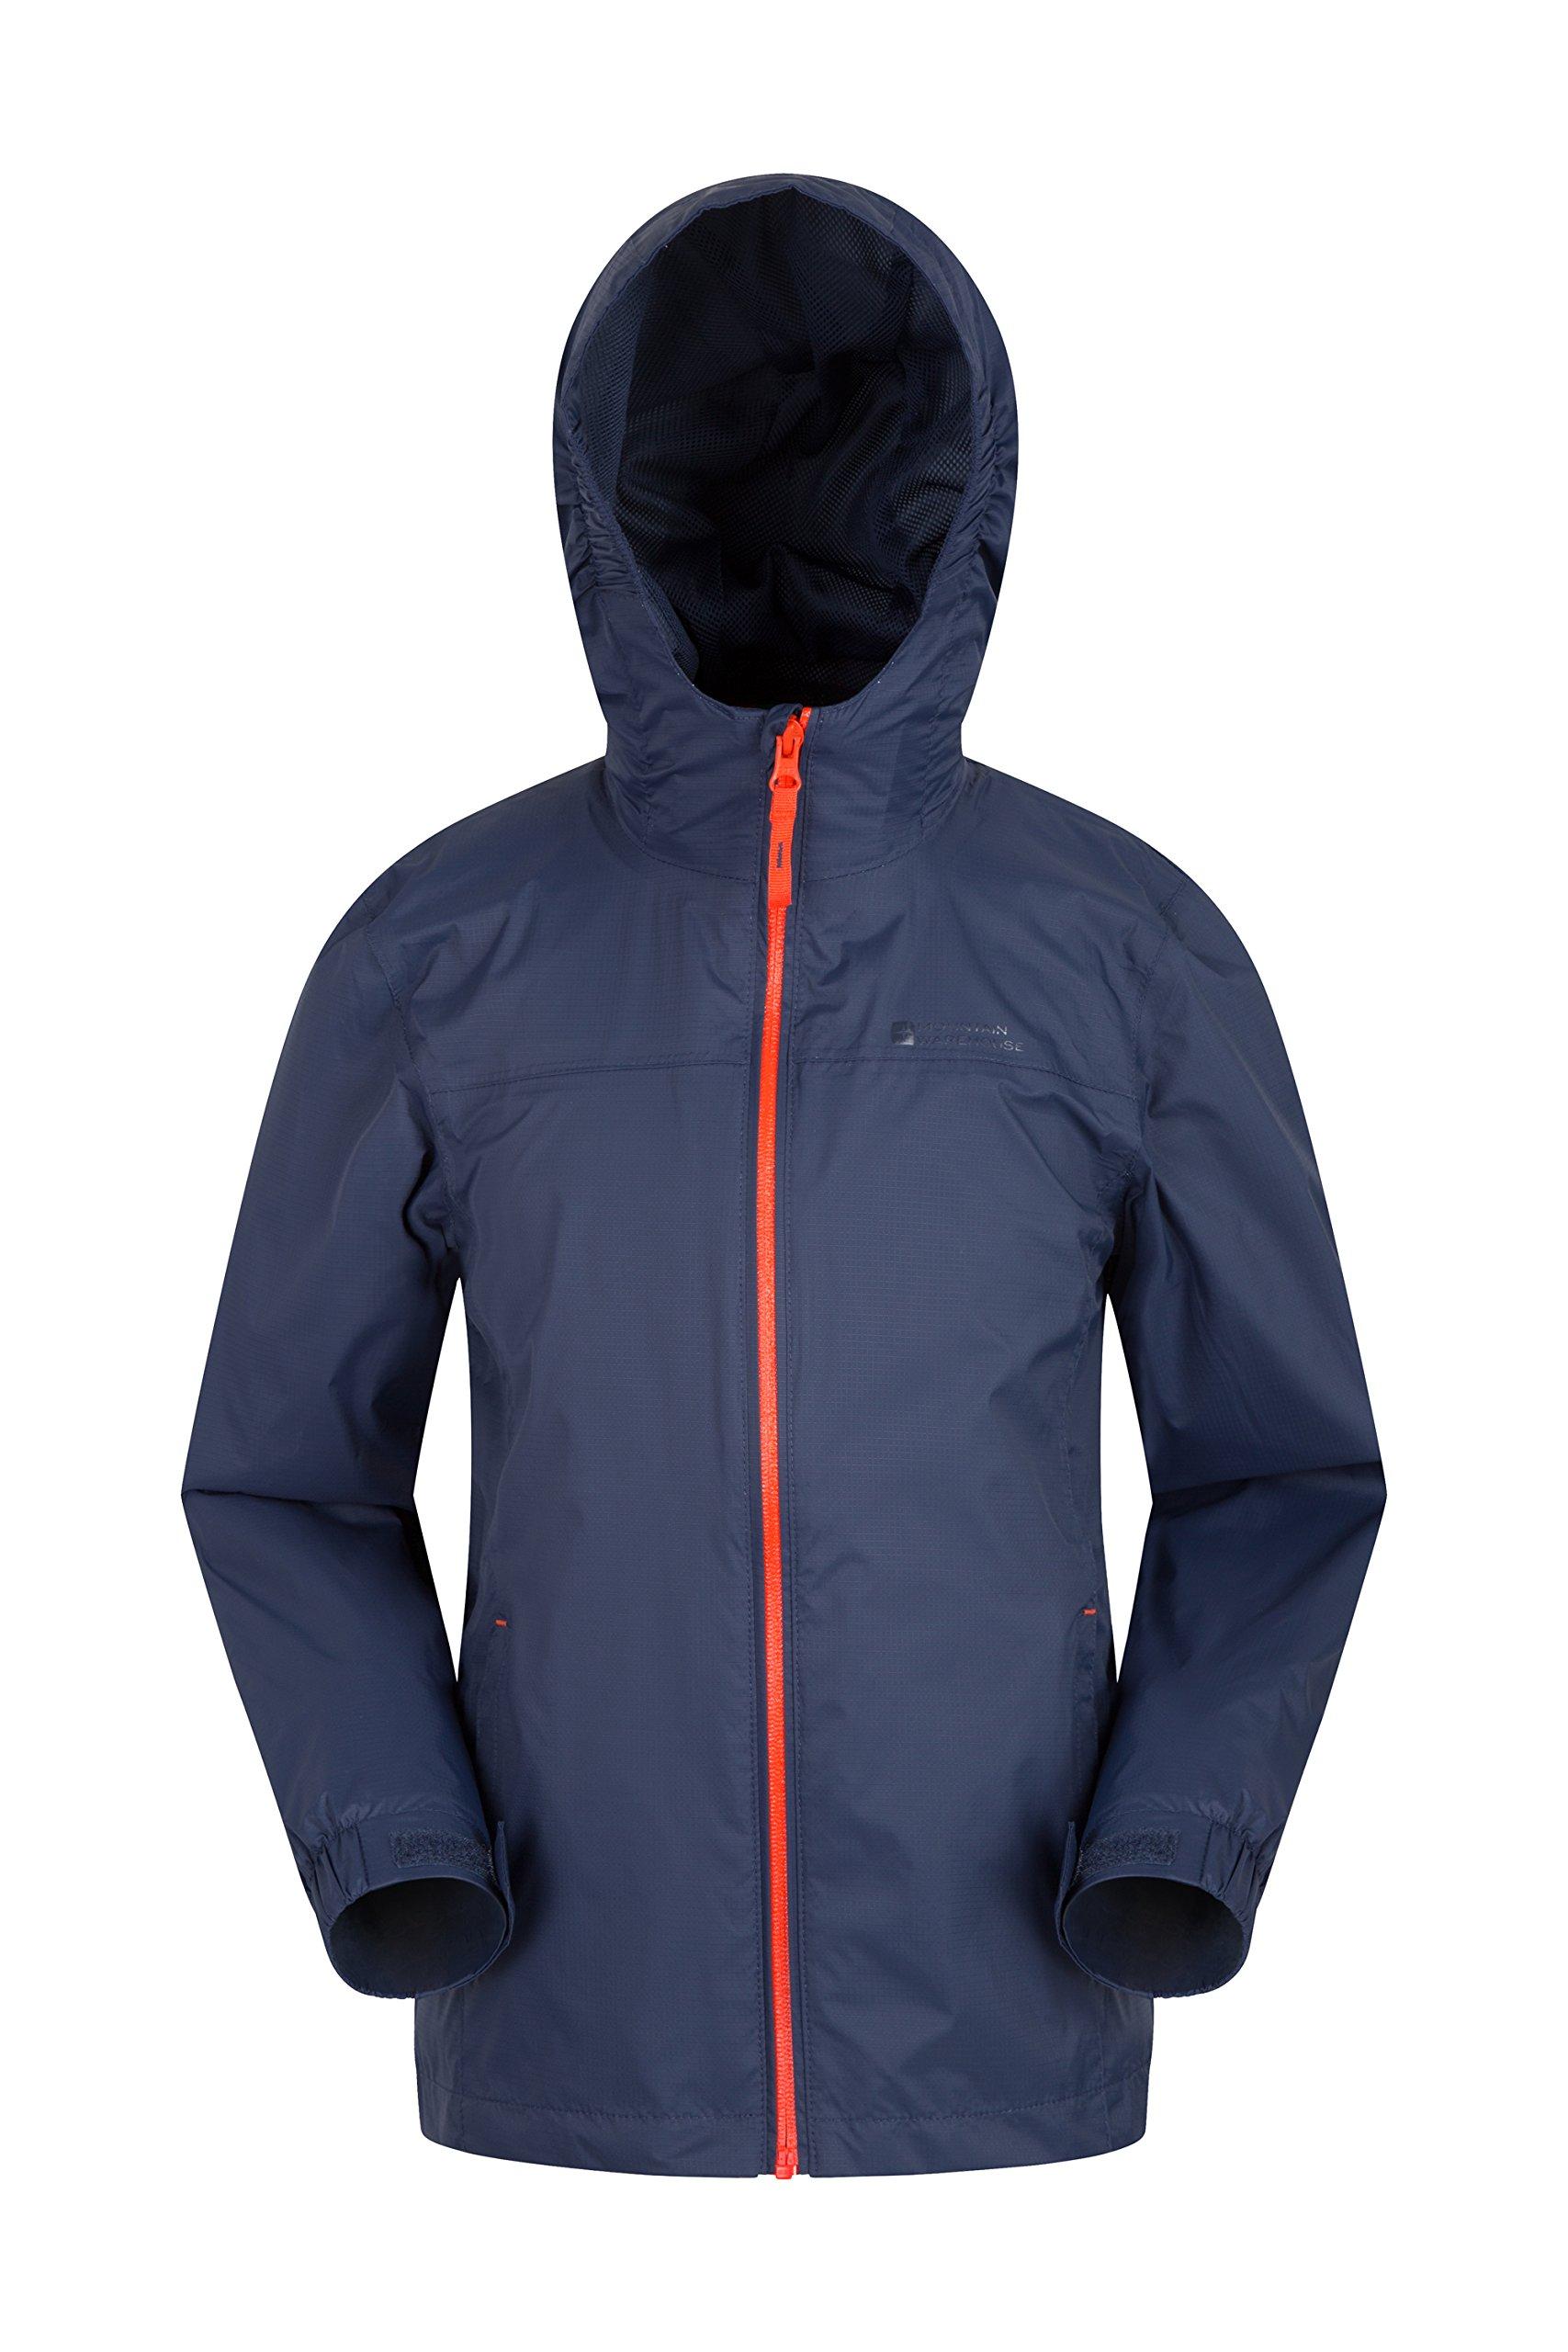 Mountain Warehouse Torrent Kids Jacket - Waterproof Rain Coat Dark Blue 9-10 Years